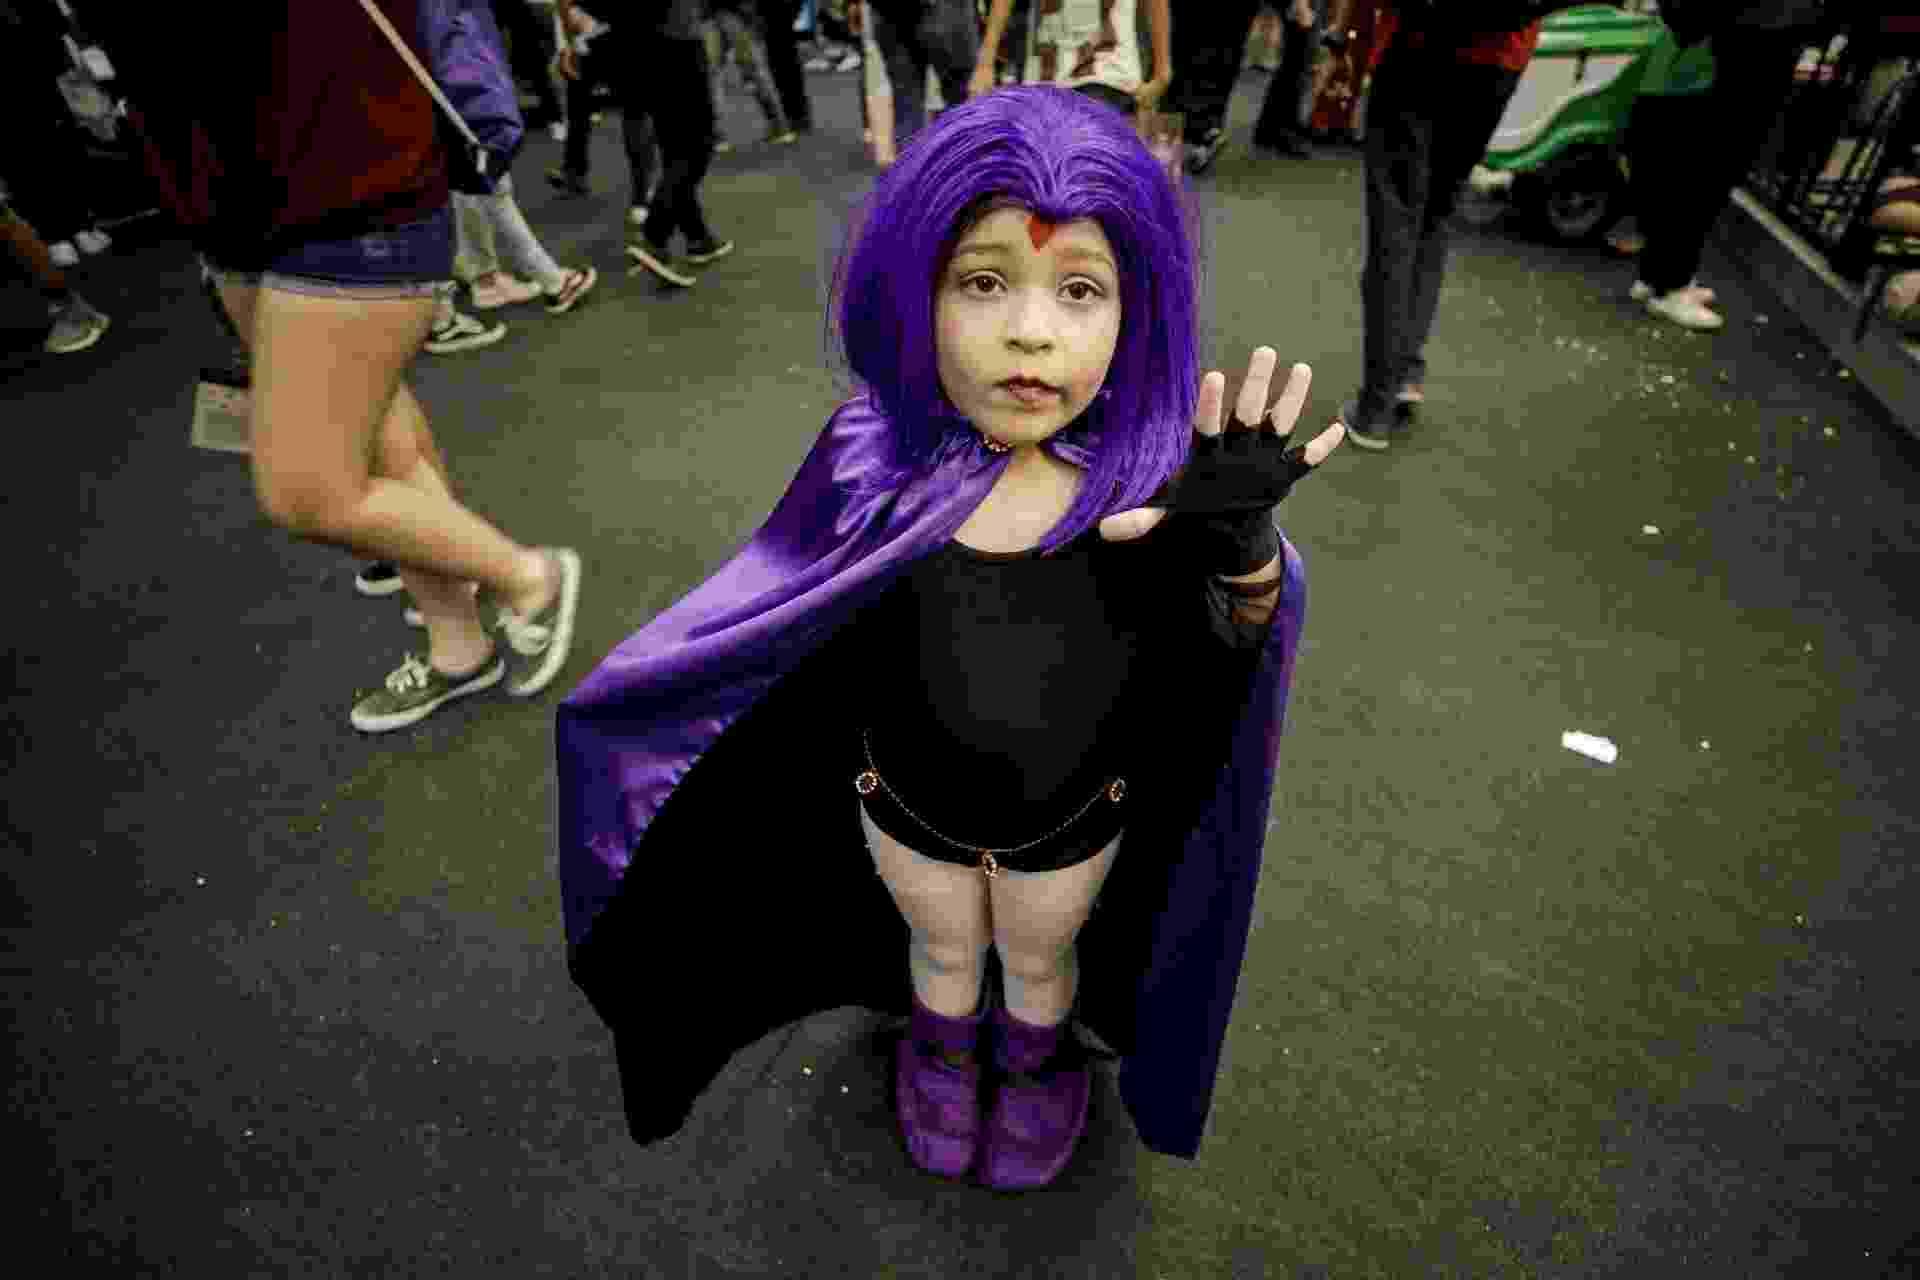 Garota faz cosplay de Ravena na CCXP 2018 - Mariana Pekin/UOL